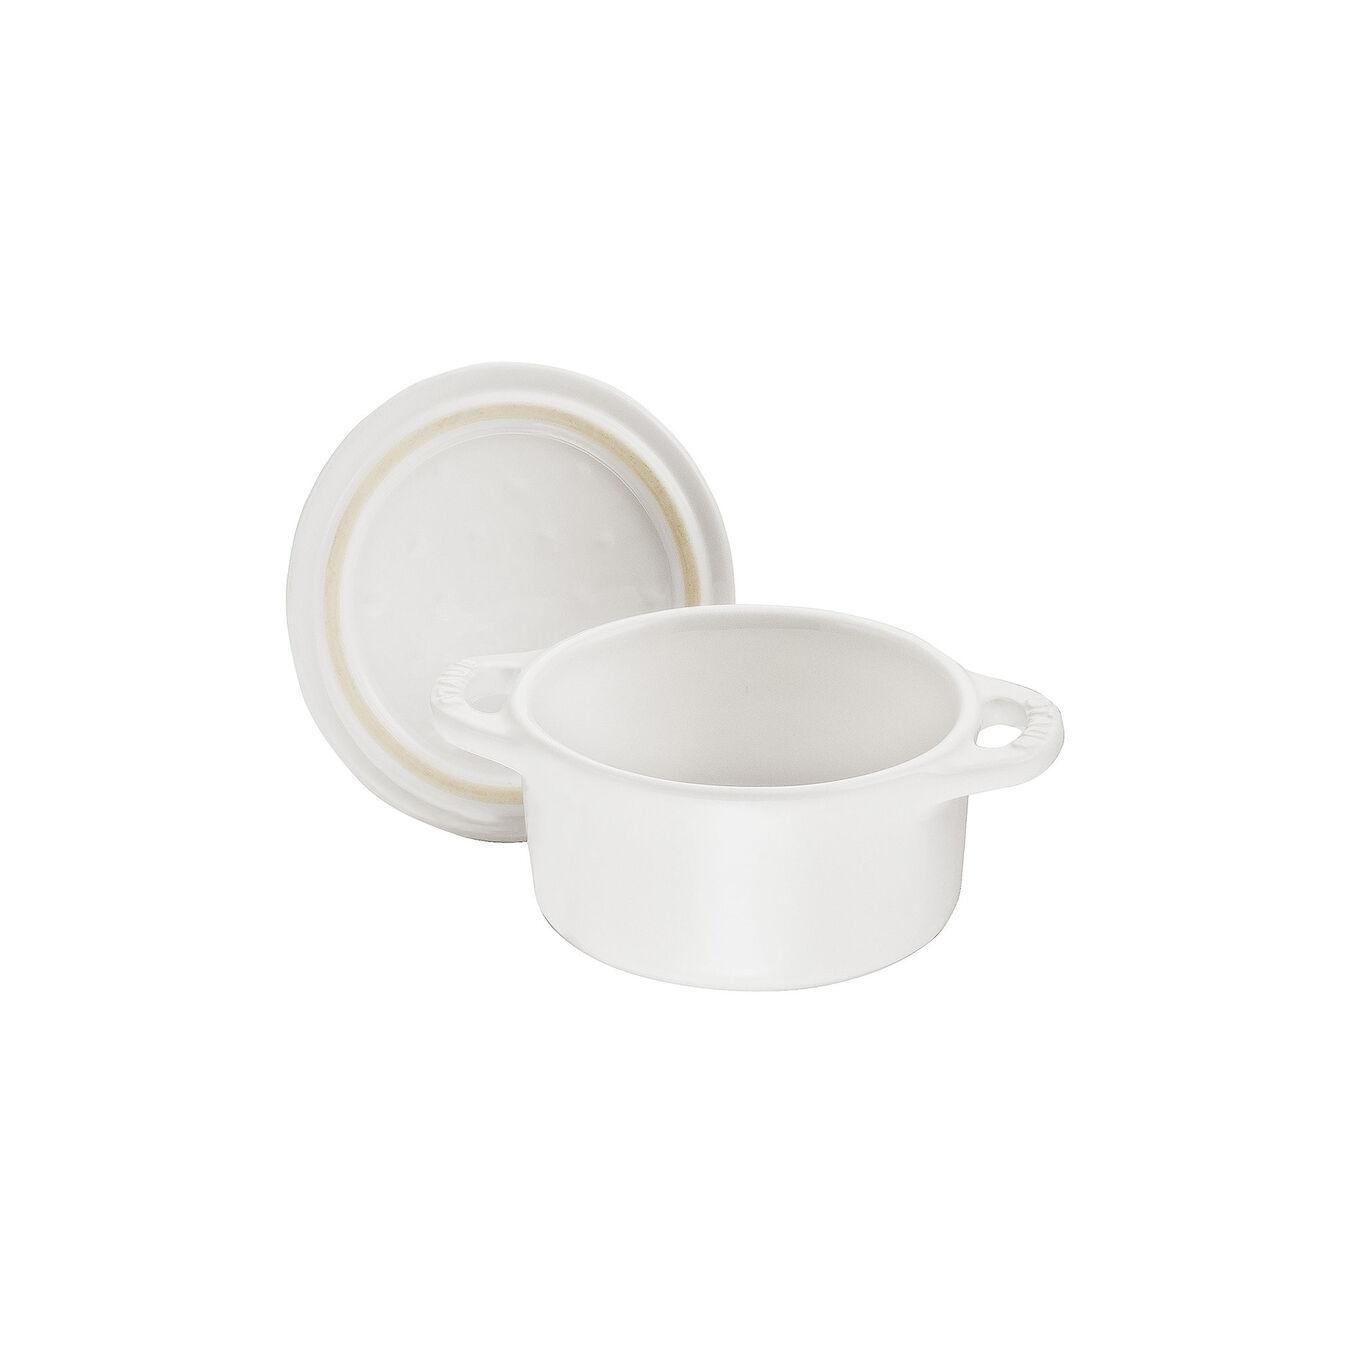 Mini Cocotte 10 cm, rund, Reinweiß, Keramik,,large 5